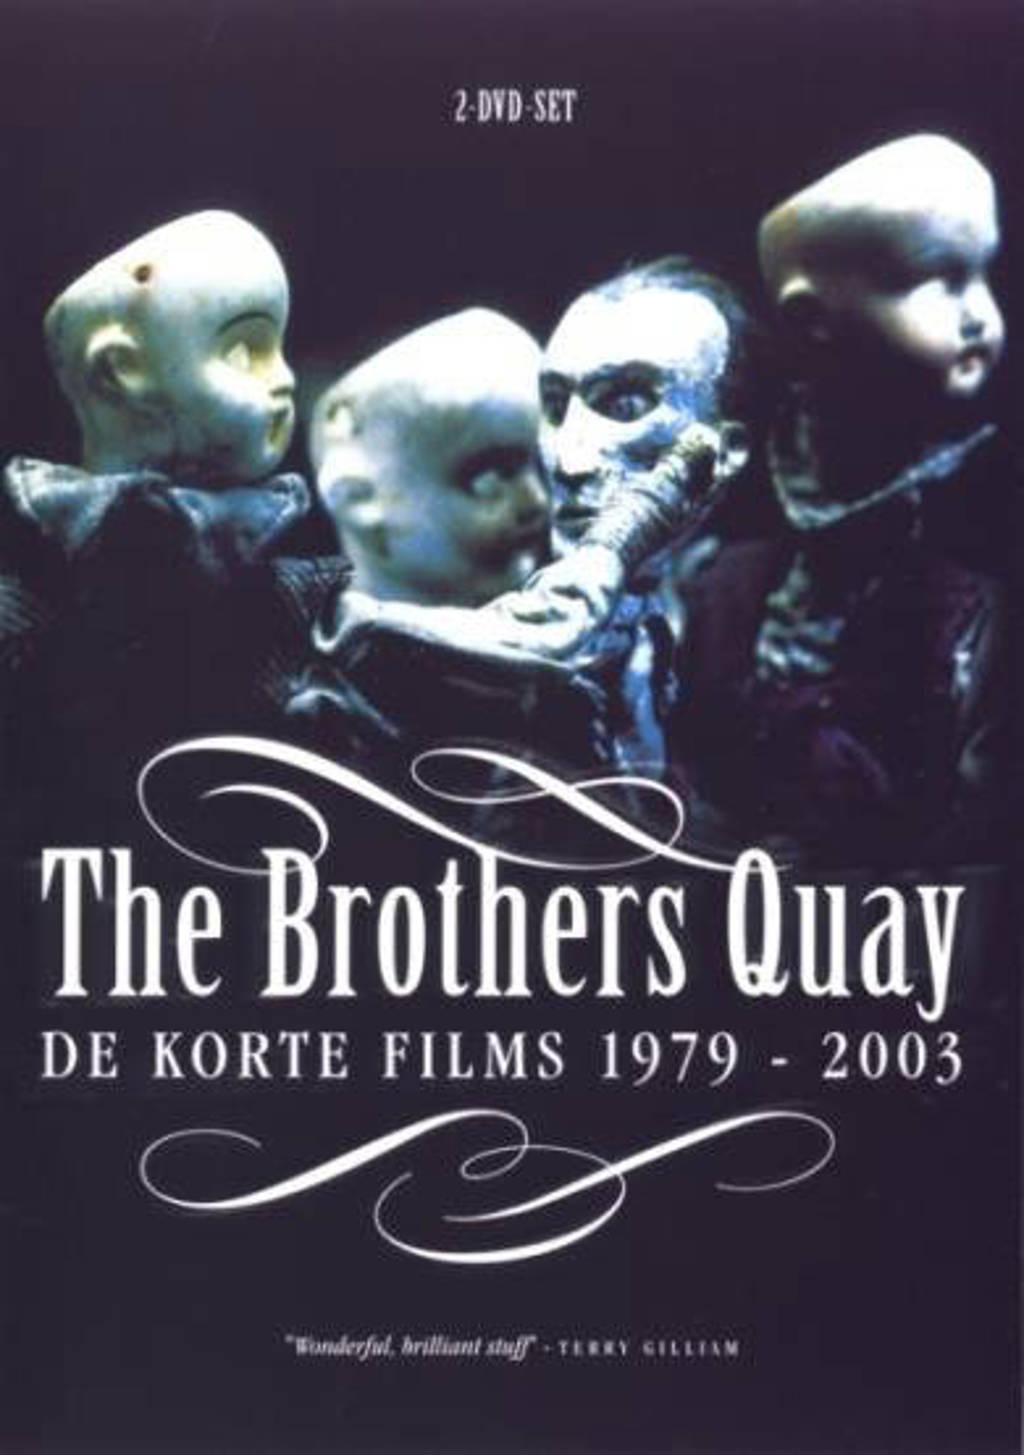 Brothers Quay-korte films 1979-2003 (DVD)